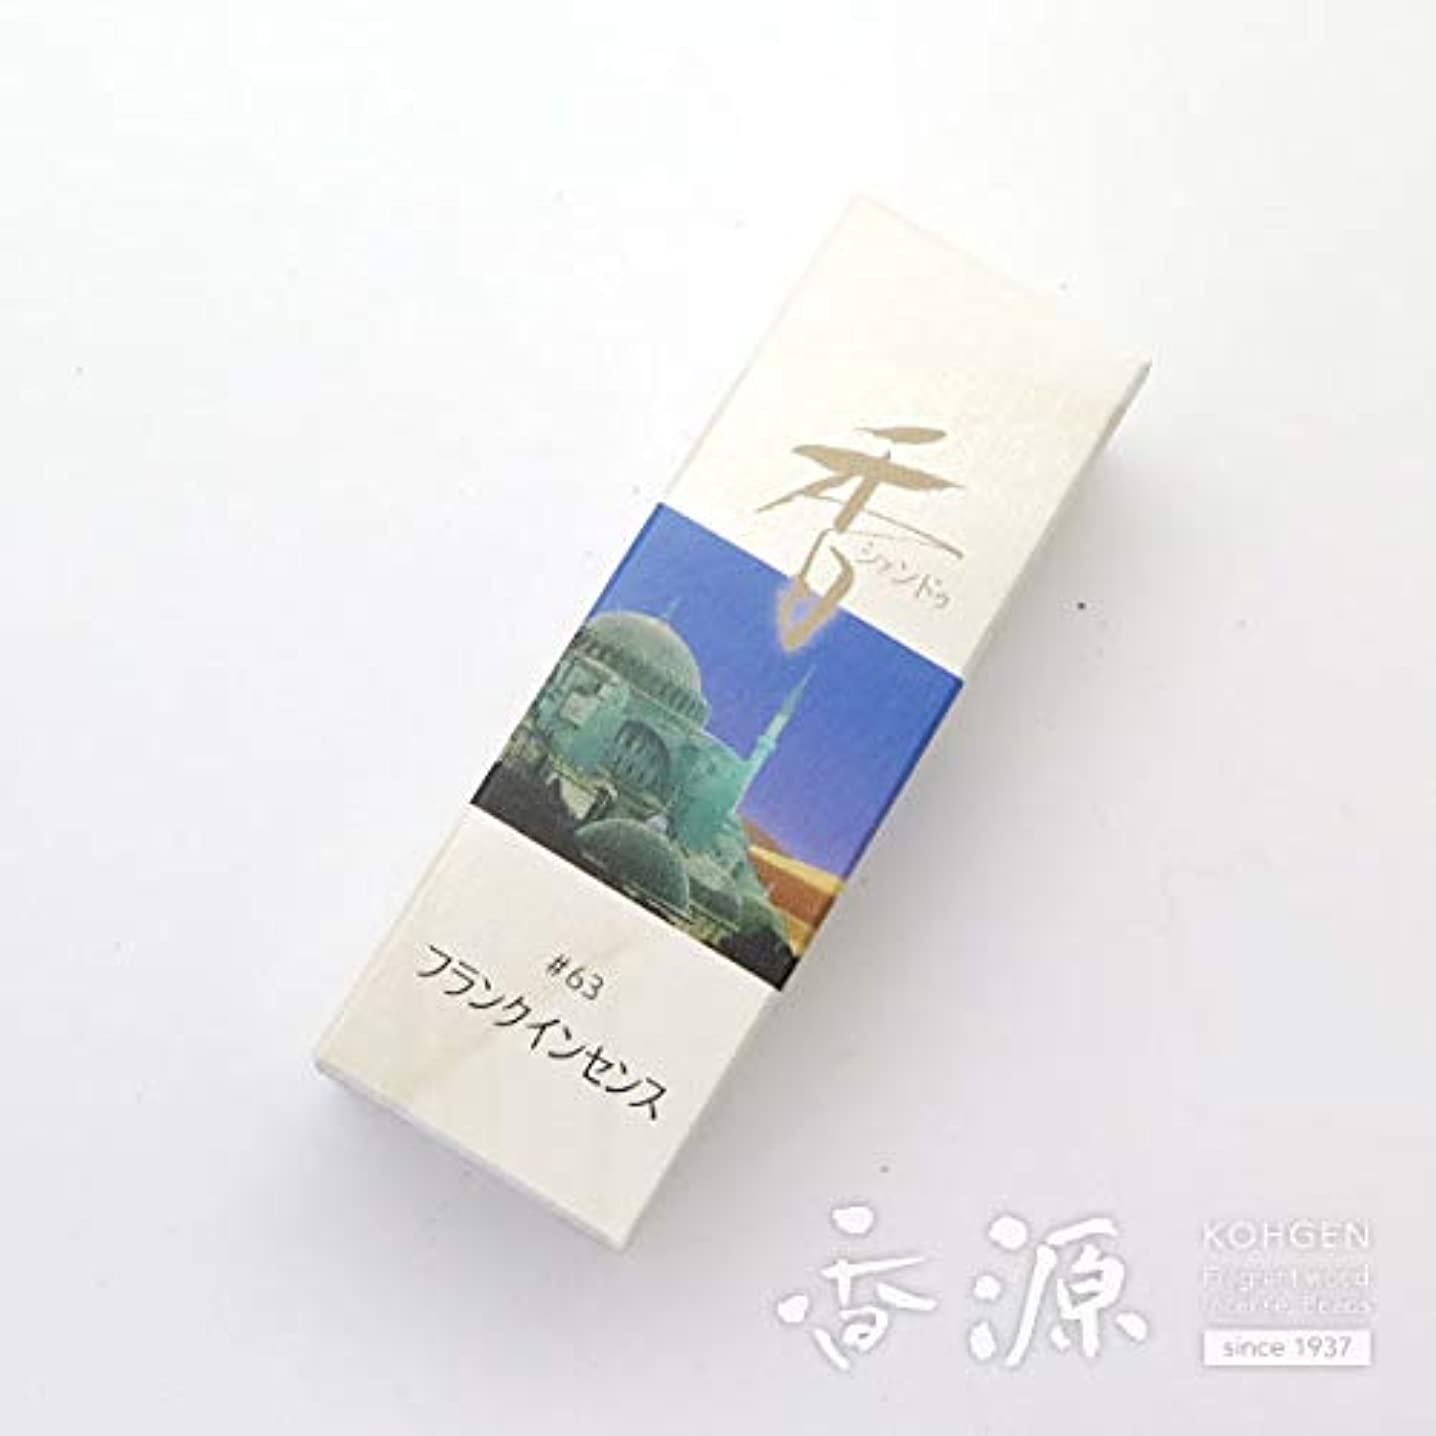 Xiang Do(シャンドゥ) 松栄堂のお香 フランクインセンス ST20本入 簡易香立付 #214263